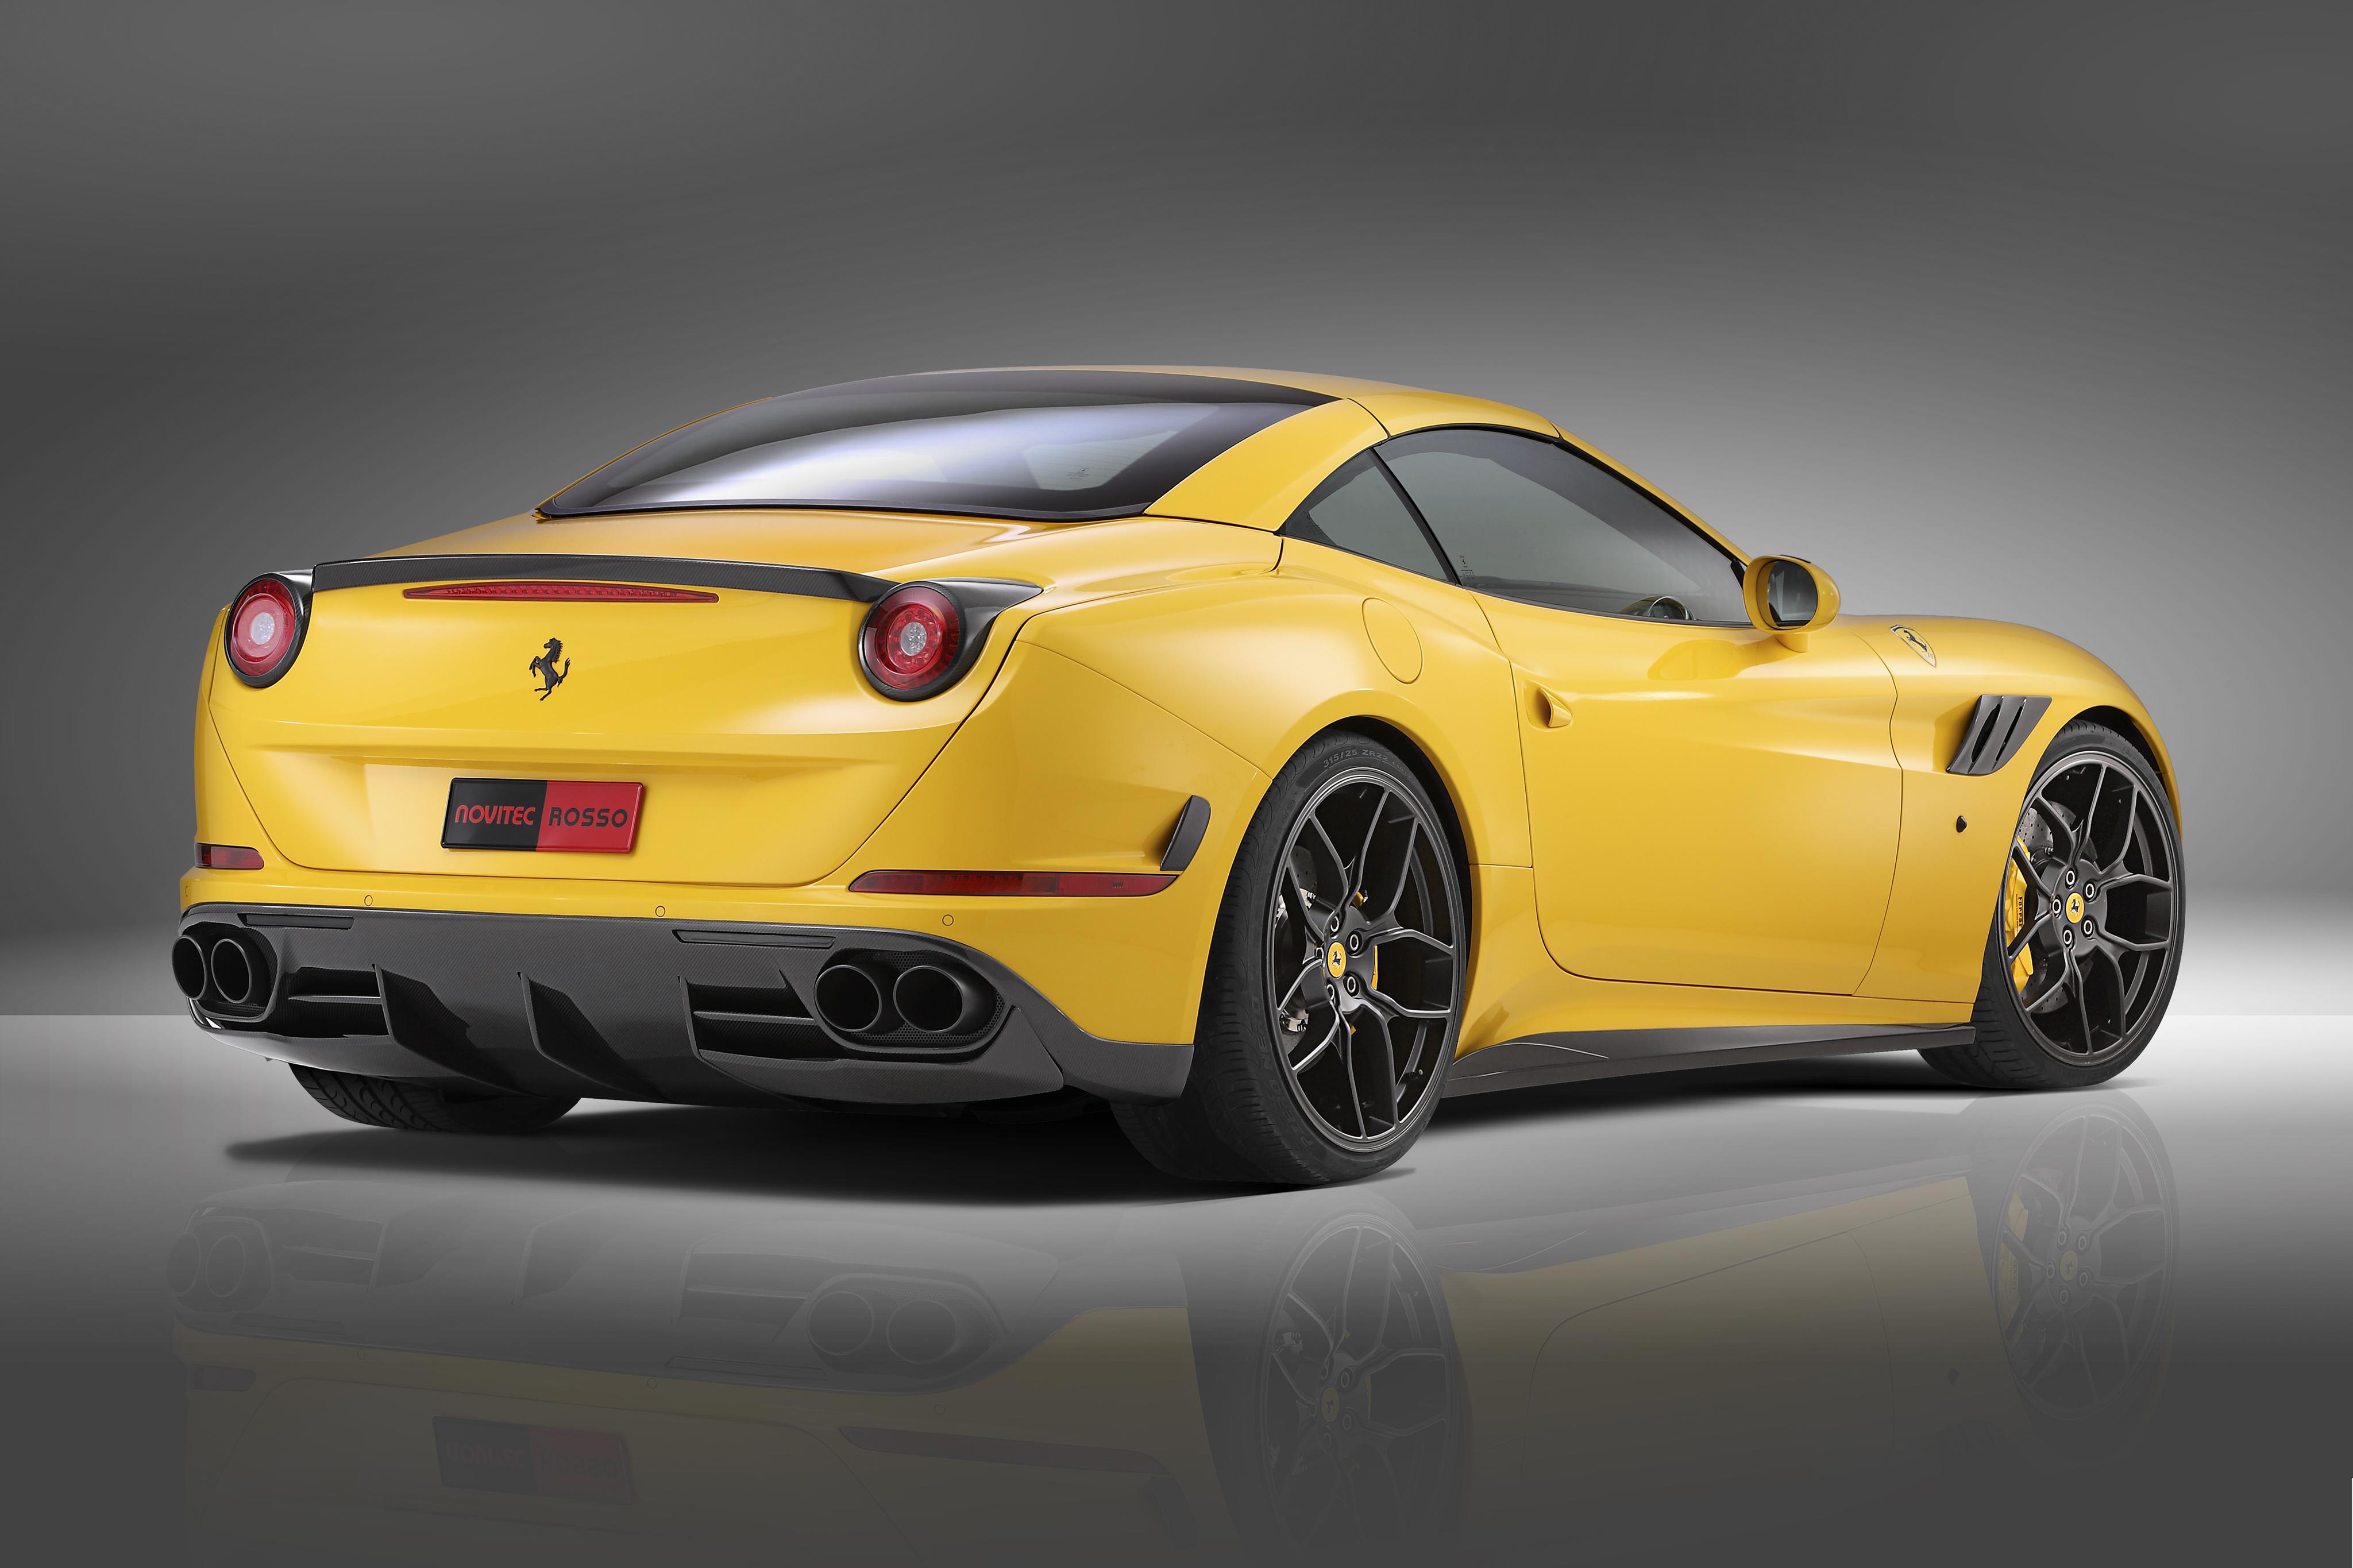 Ferrari california t wallpapers pictures images ferrari california t wallpaper 4096x2730 voltagebd Gallery